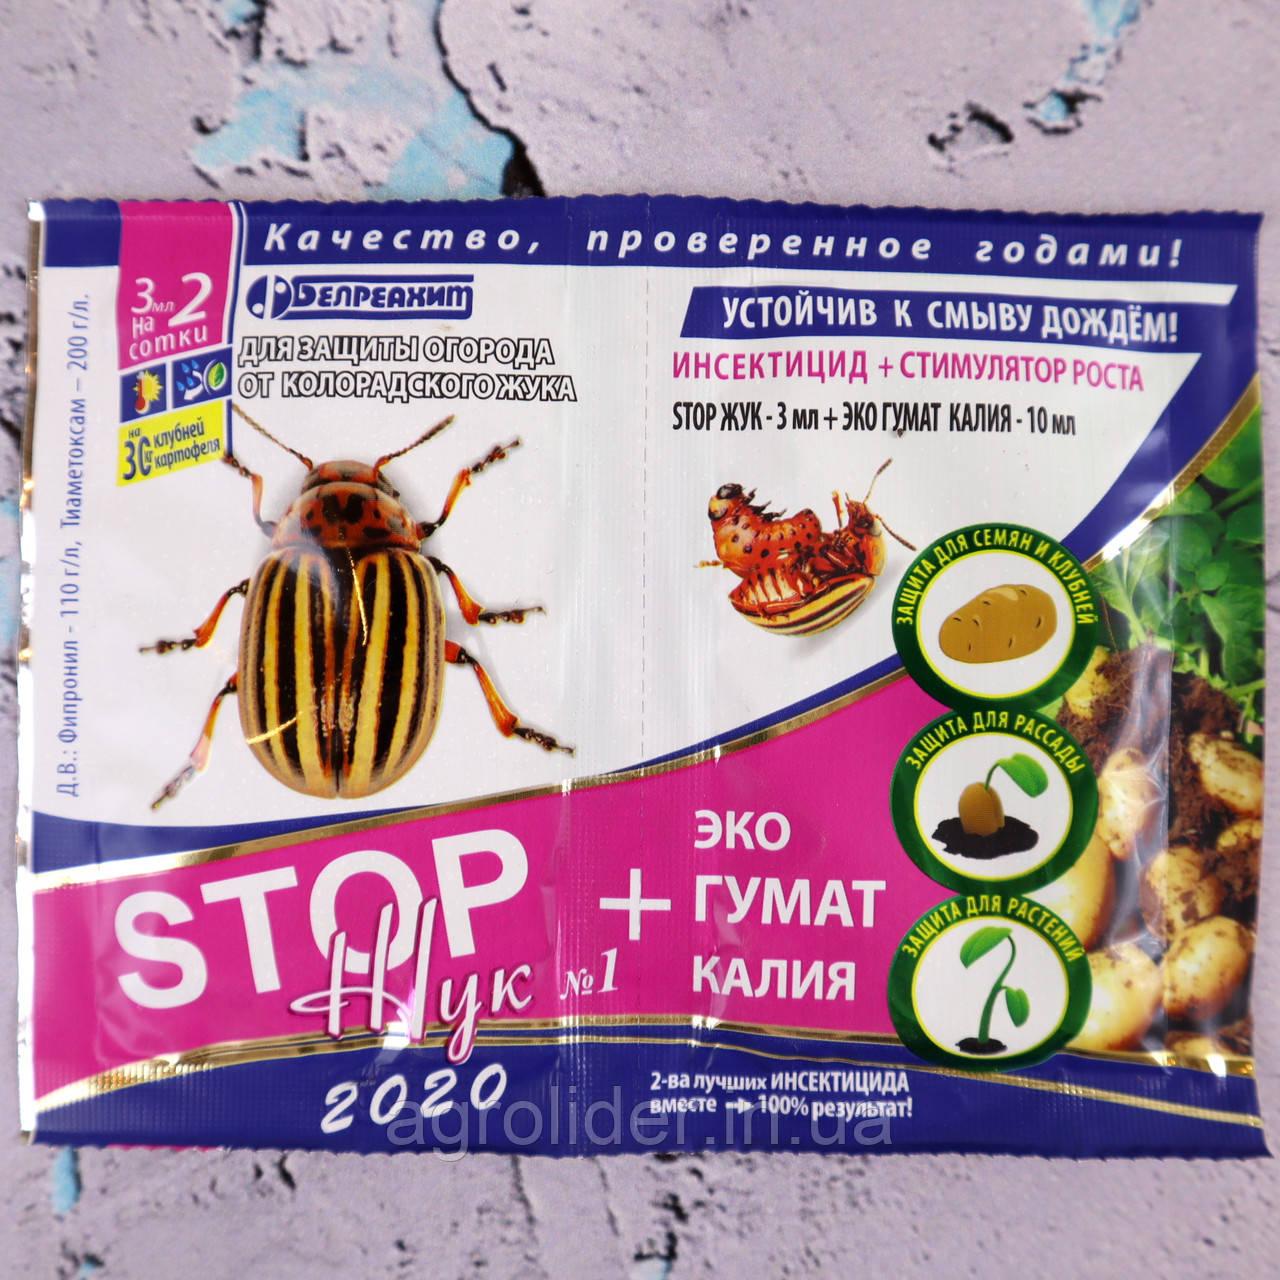 Инсектицид «STOP Жук» 3 мл и стимулятор роста «ЭКО ГУМАТ КАЛИЯ» 10 мл